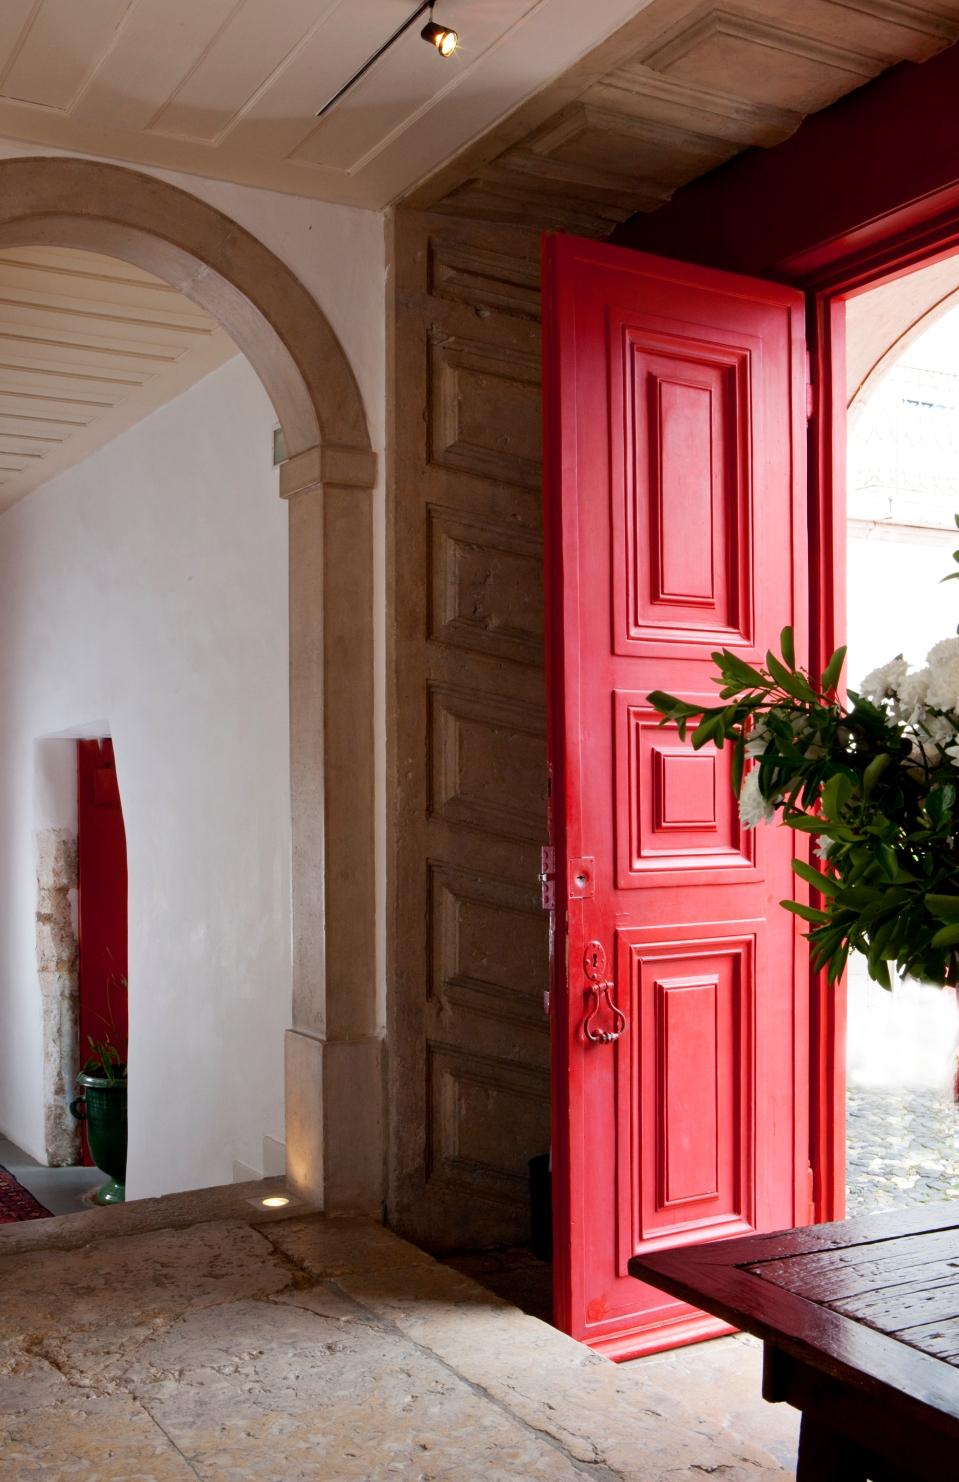 Detail of entrance © Jacob Termasen